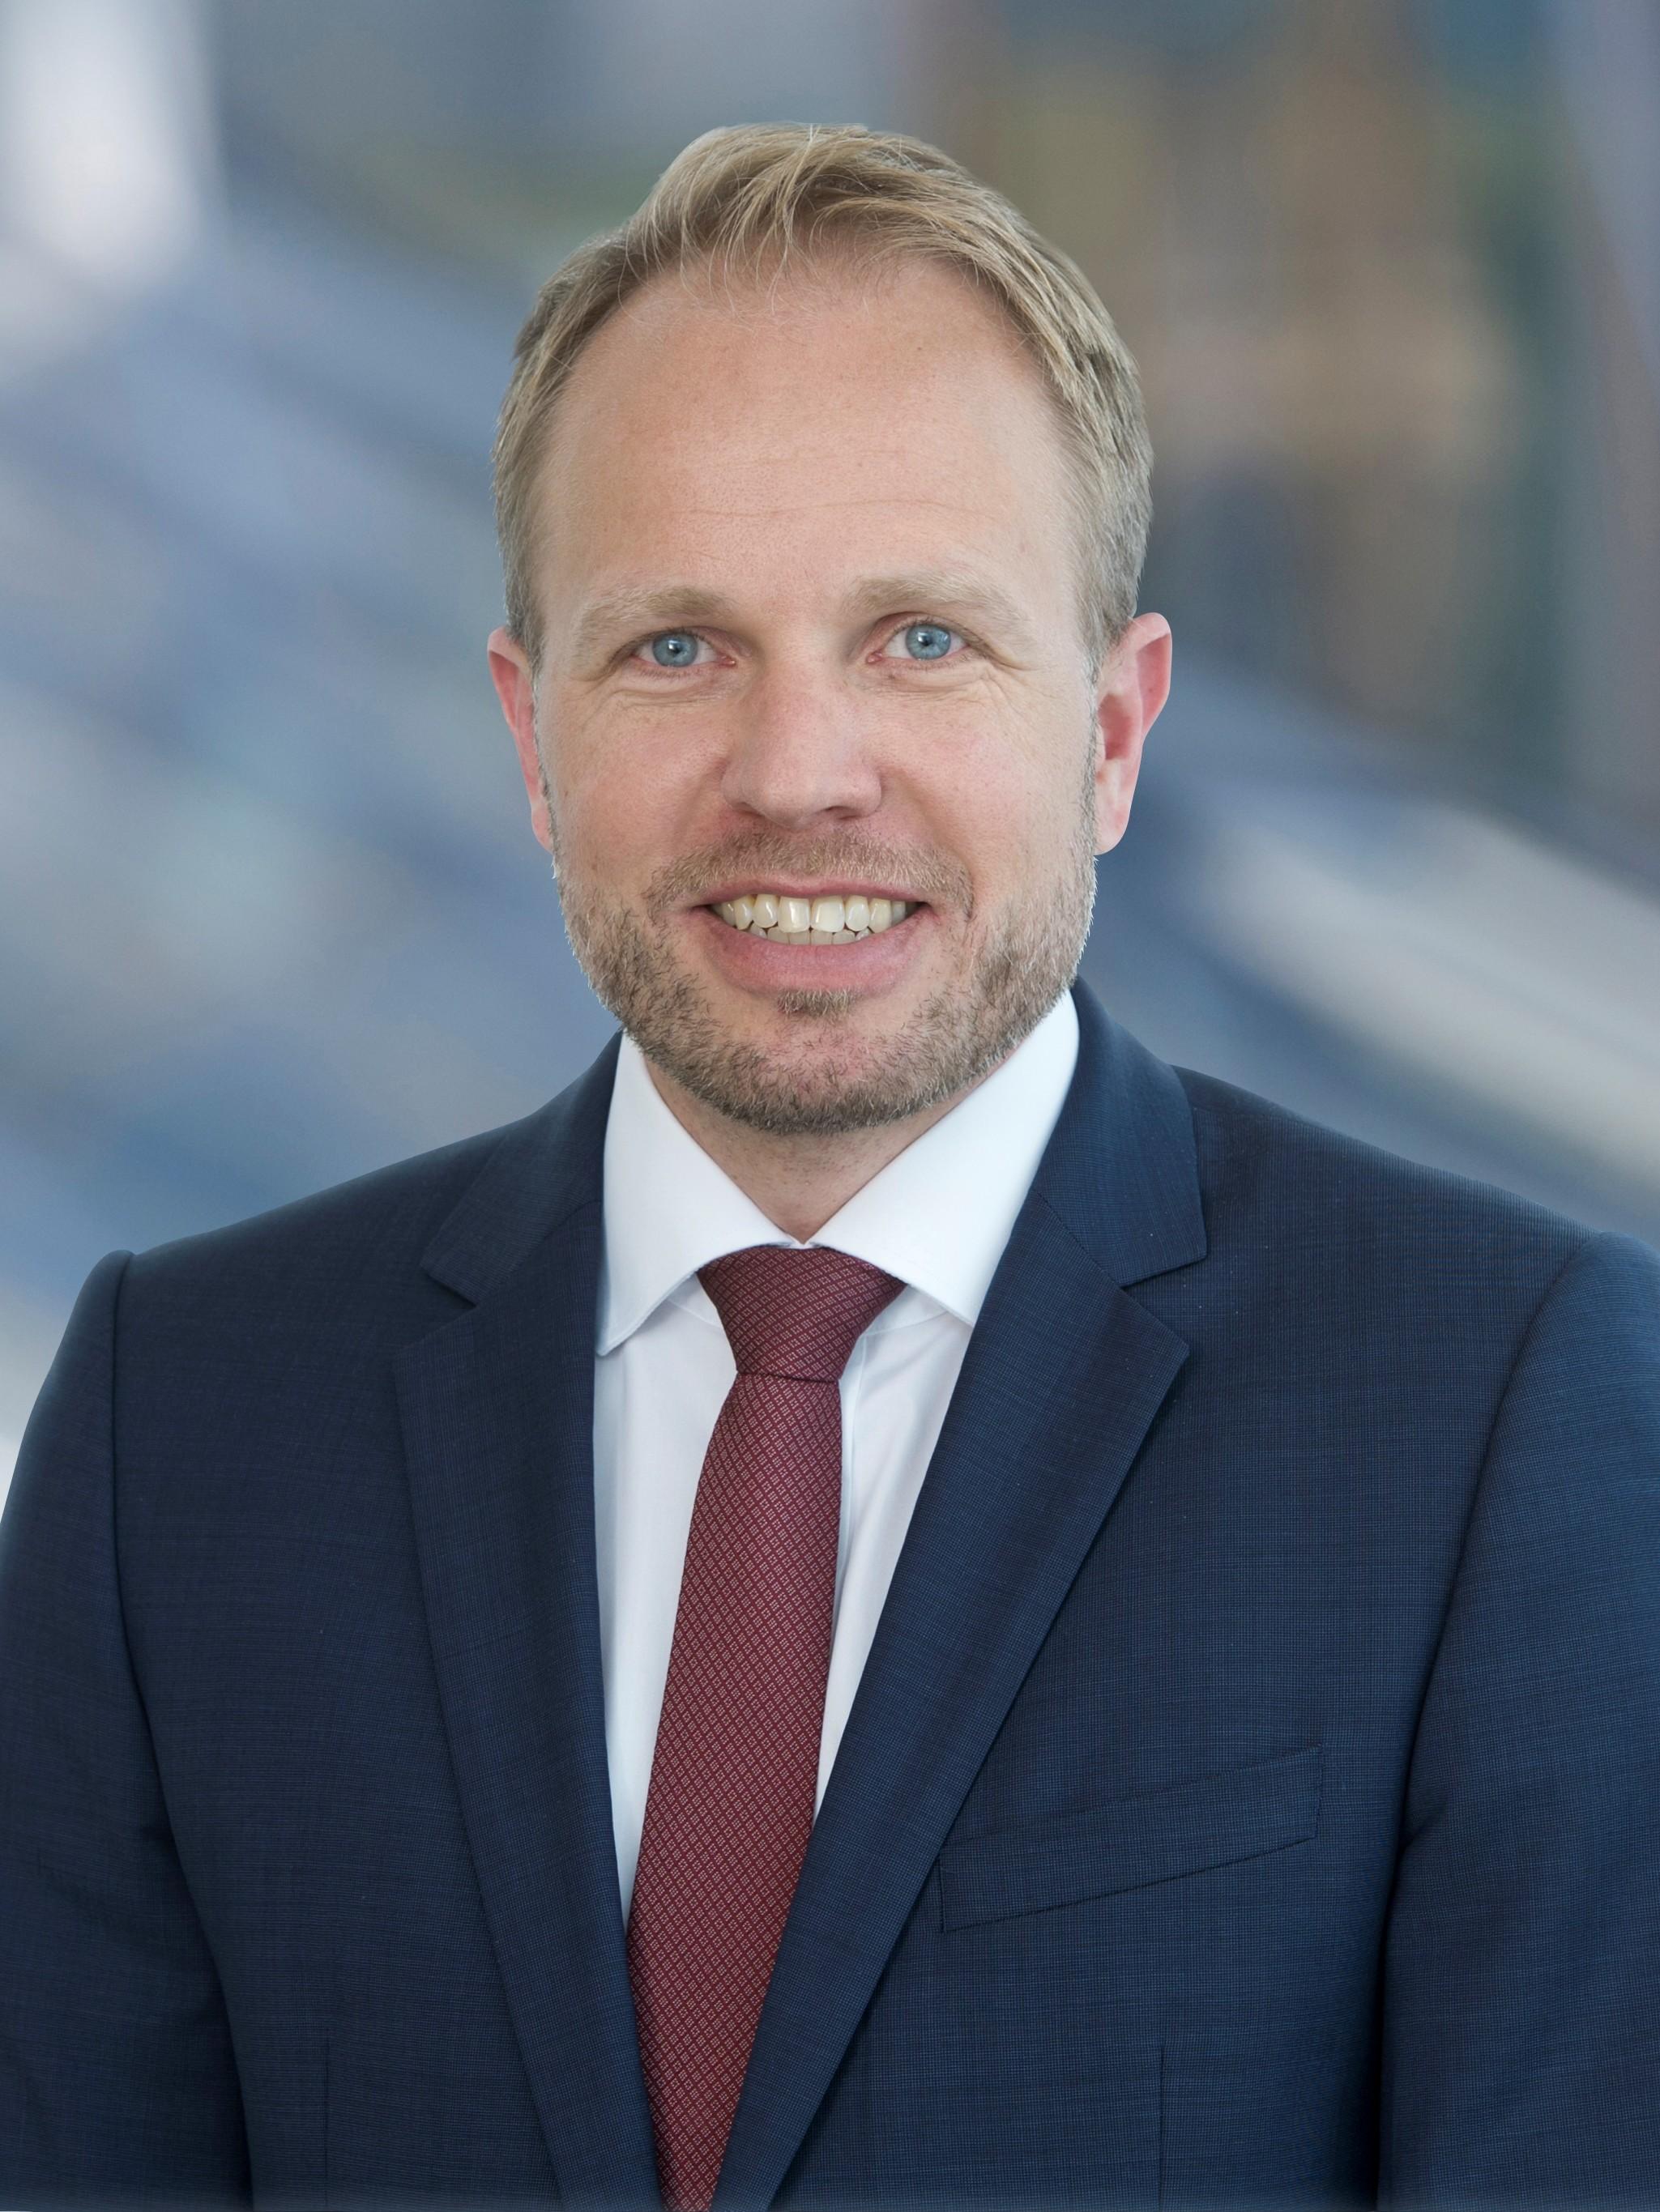 Björn Knothe